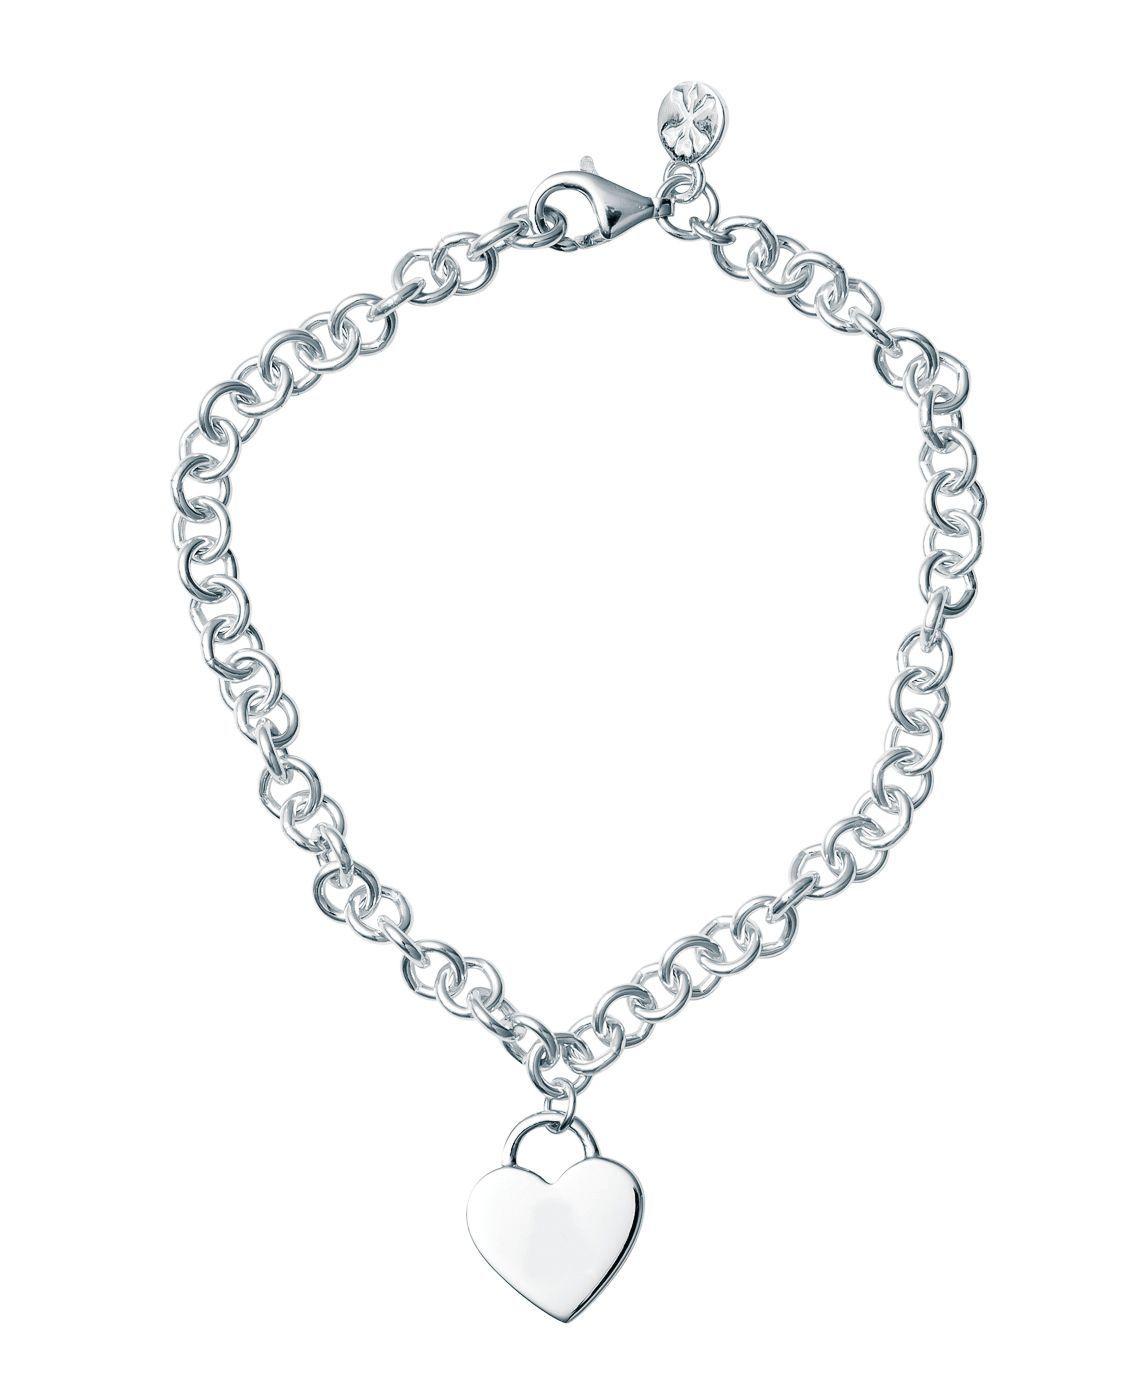 Bo + Bala: Heart Padlock Charm Bracelet - Plain image